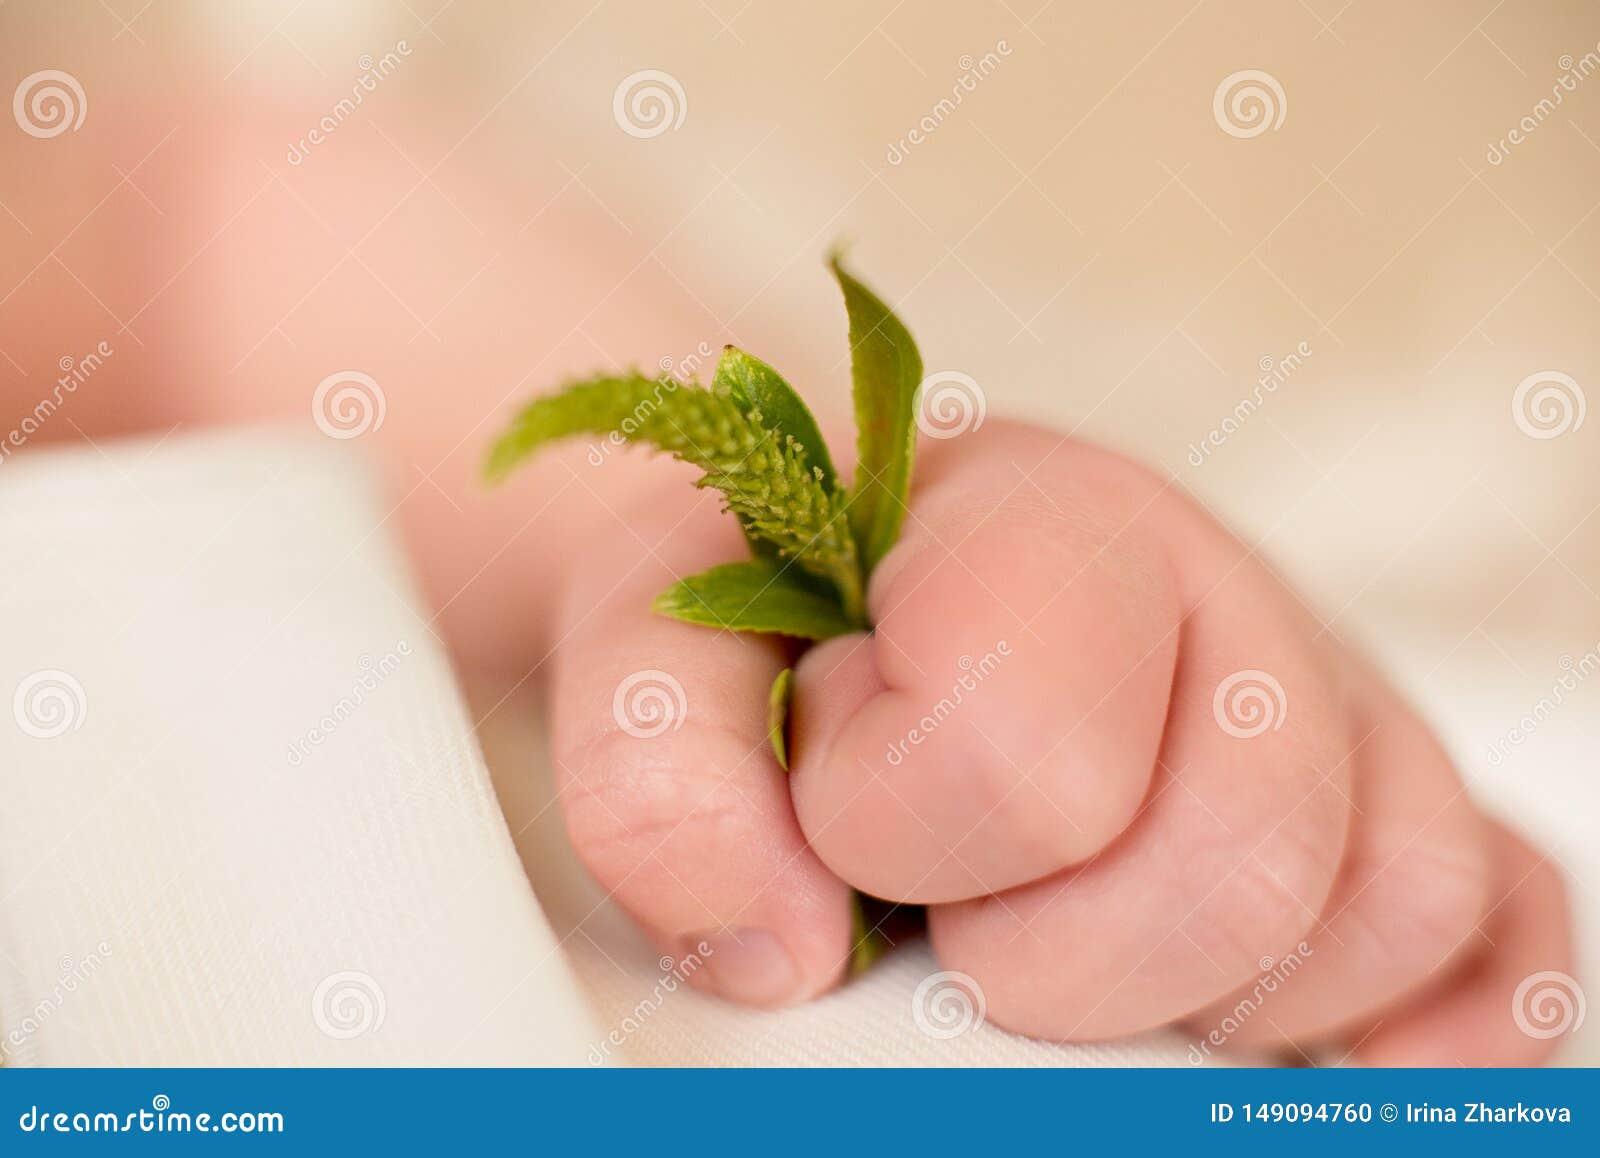 Den gr?na v?ren fattar i handen av ett nyf?tt barn, b?rjan av liv, v?ren som v?cker, v?r